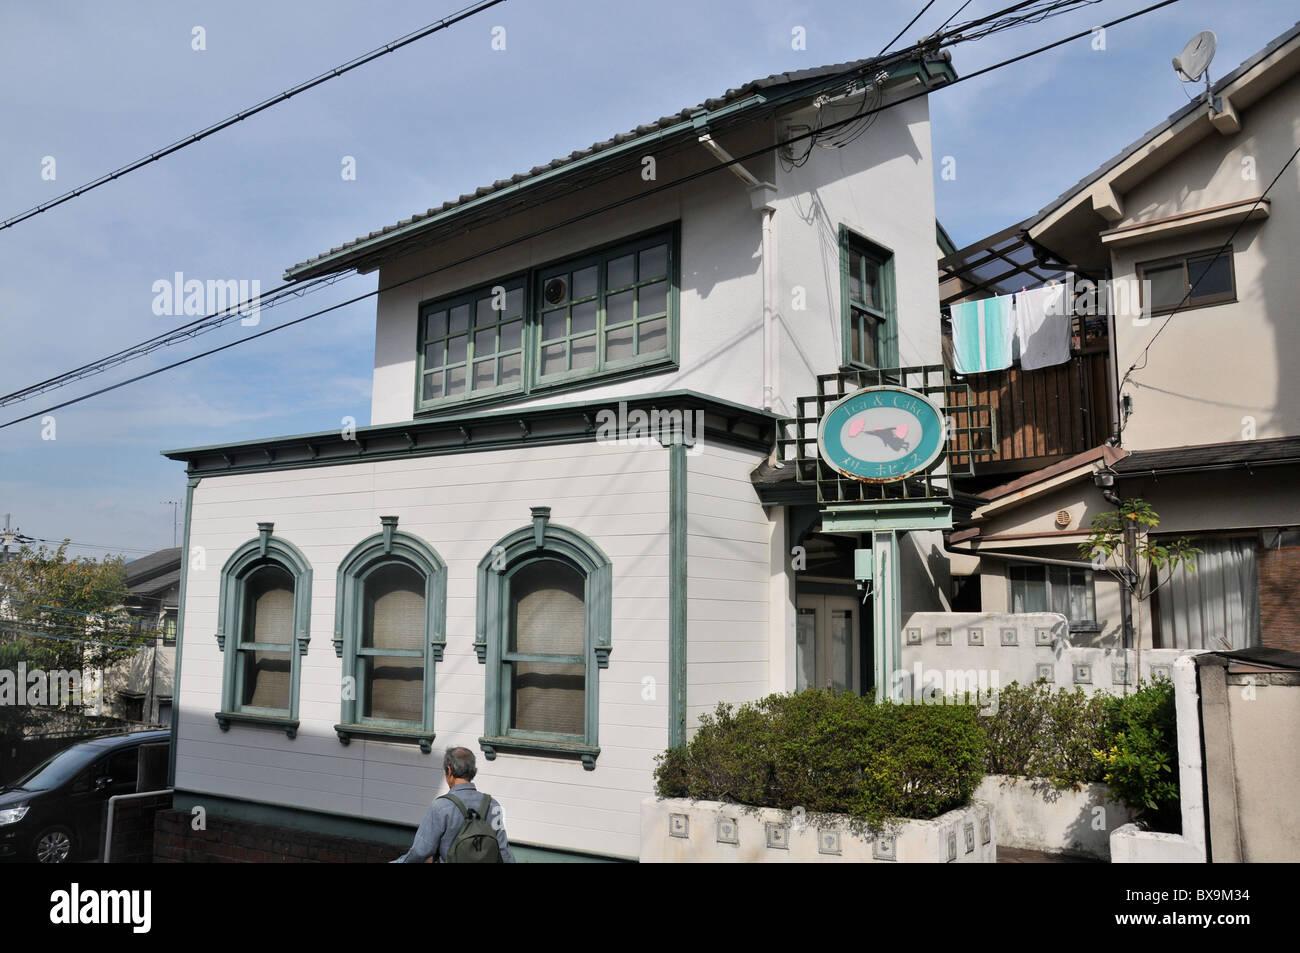 Tea and Cake cafe, Philosopher's path, Kyoto, Japan Stock Photo